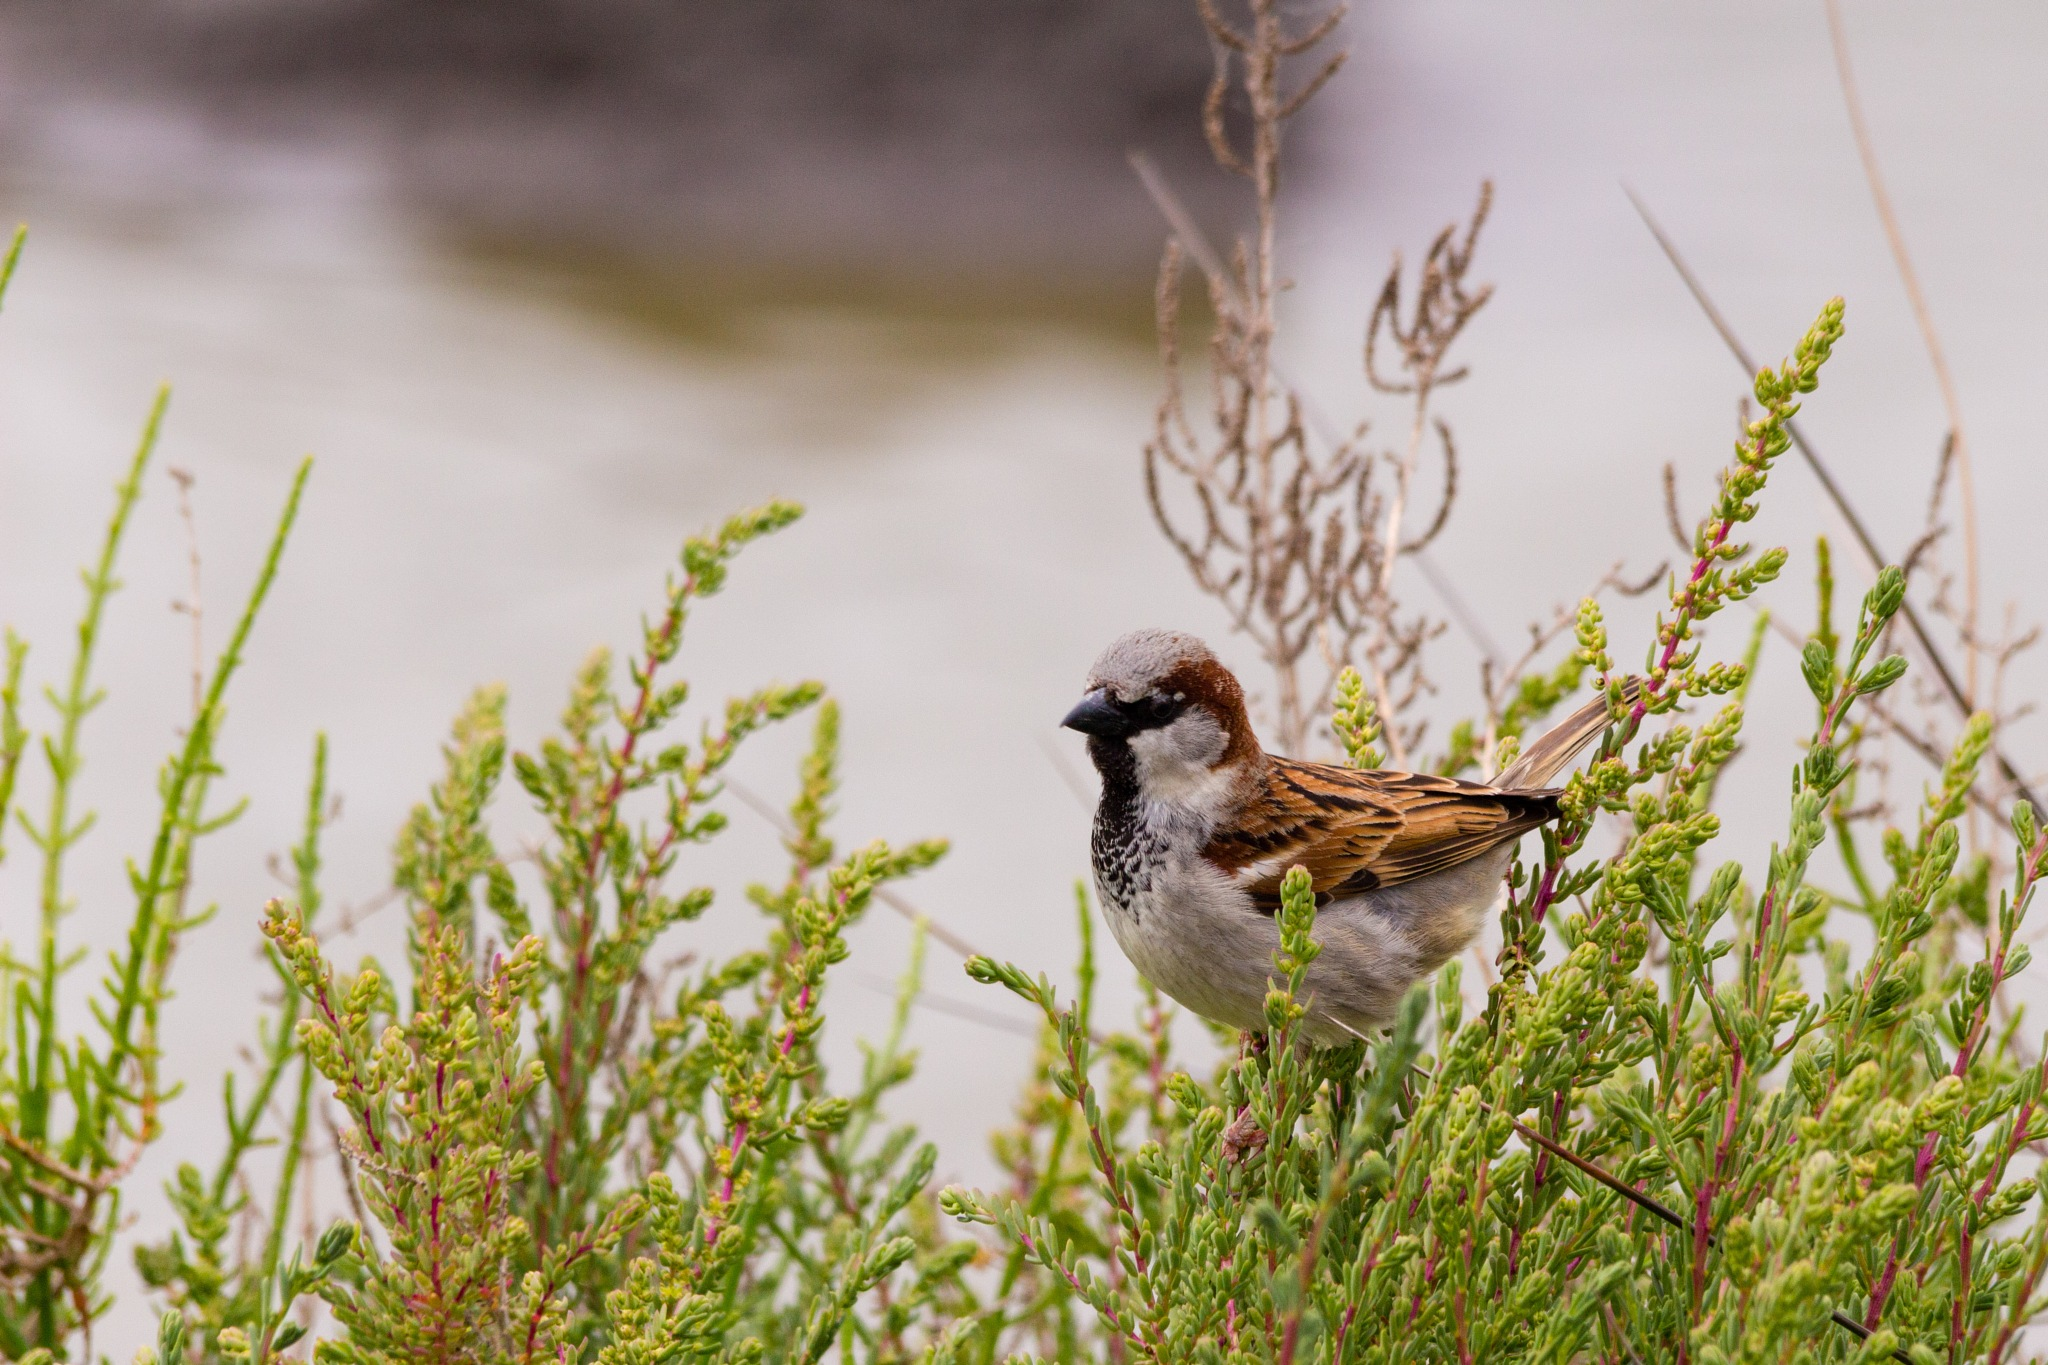 House sparrow in a bush by Andrea Prestileo